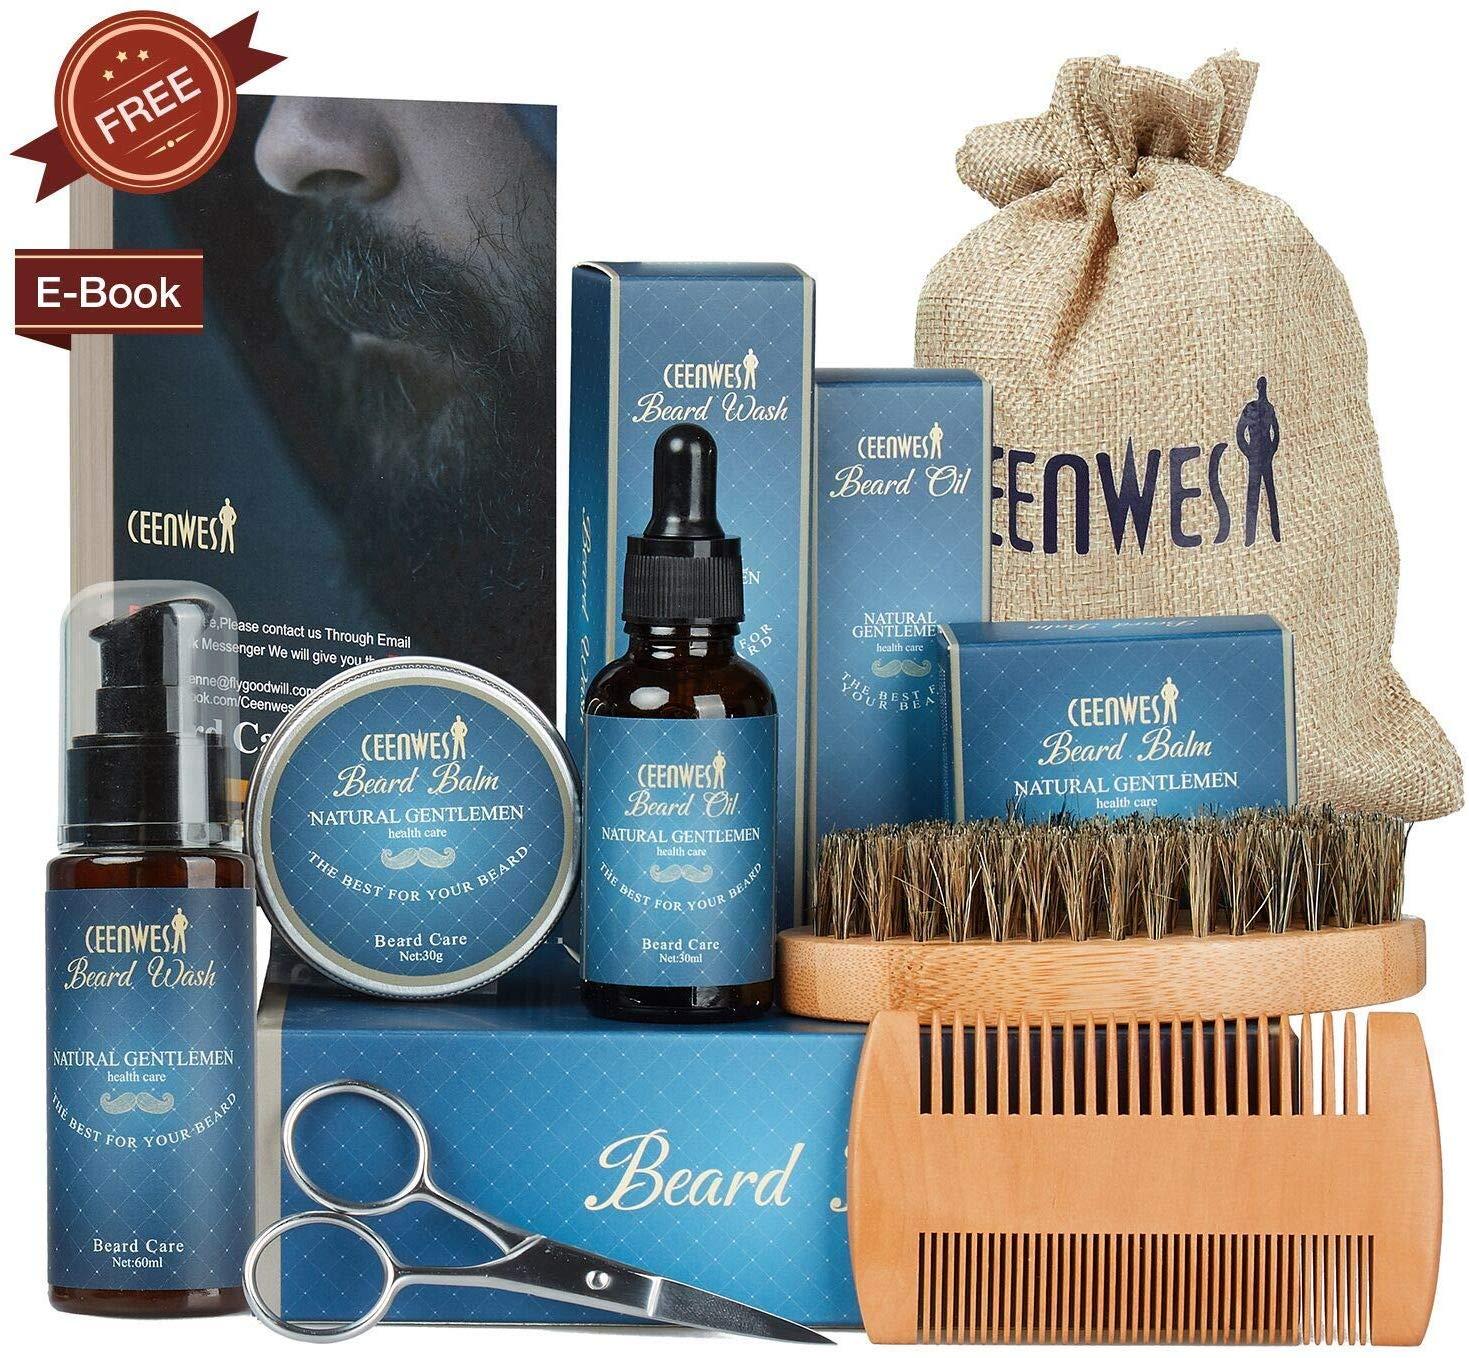 Ceenwes 9 in 1 Beard Grooming Kit